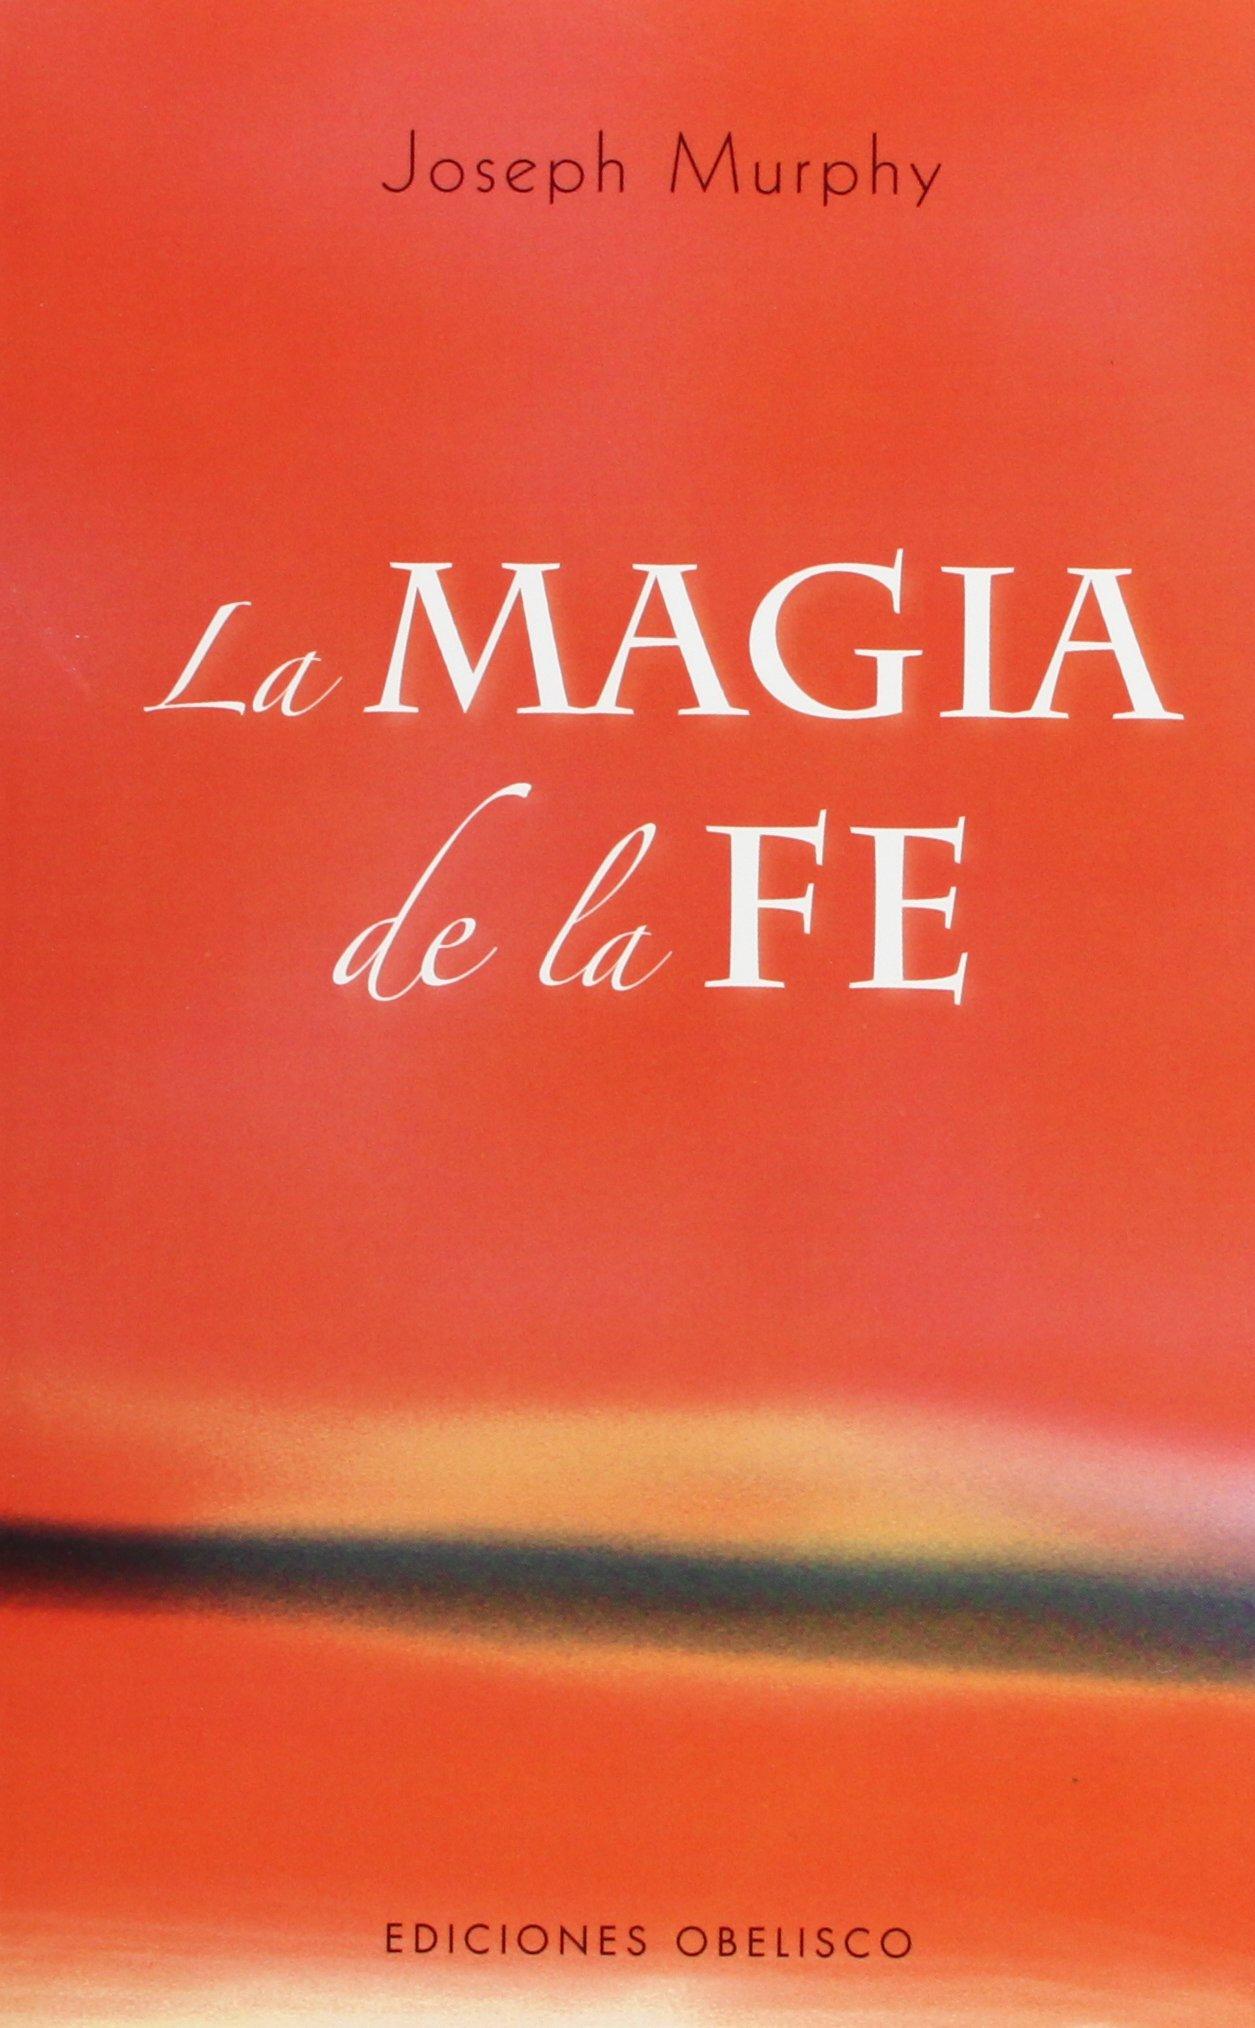 Magia de la fe (Spanish Edition) pdf